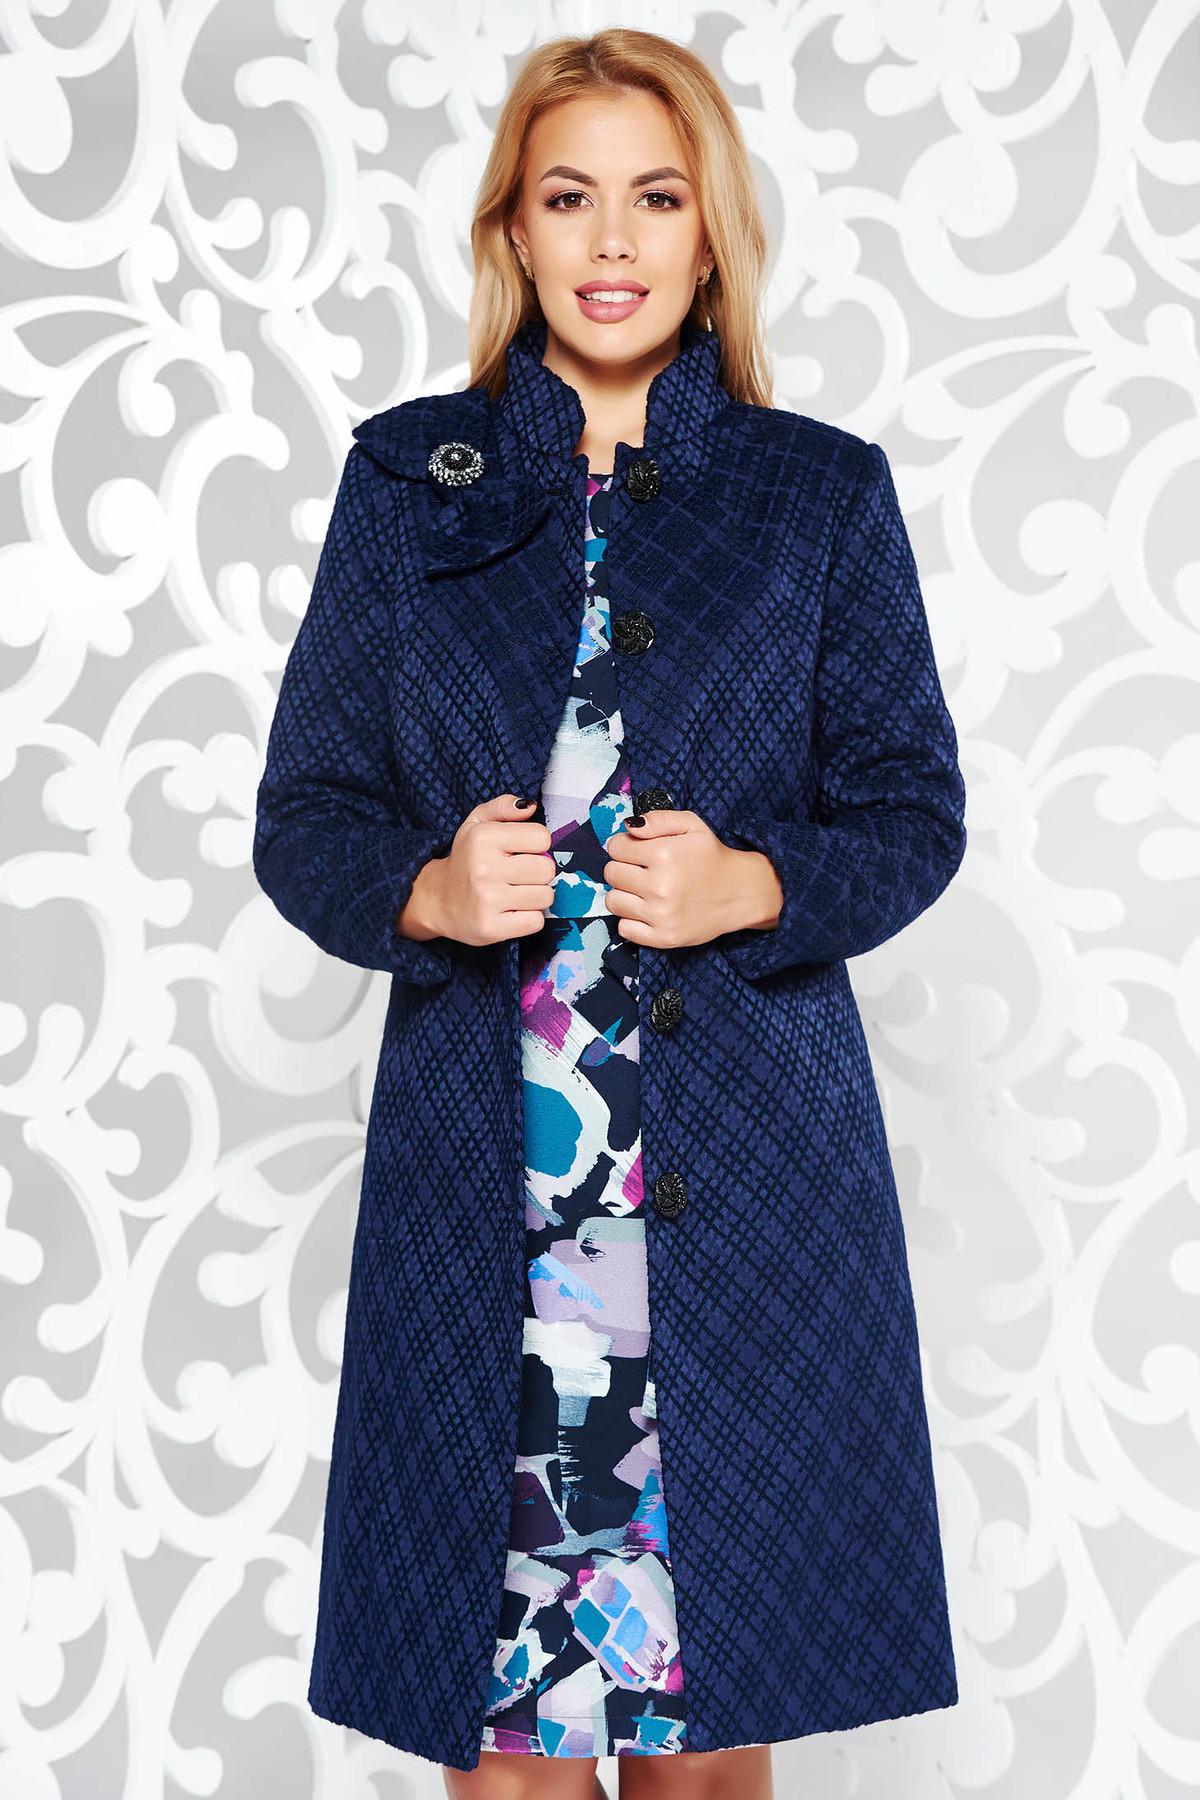 Palton Albastru-inchis Elegant Cu Un Croi Cambrat Din Stofa Neelastica Captusit Pe Interior Cu Buzunare